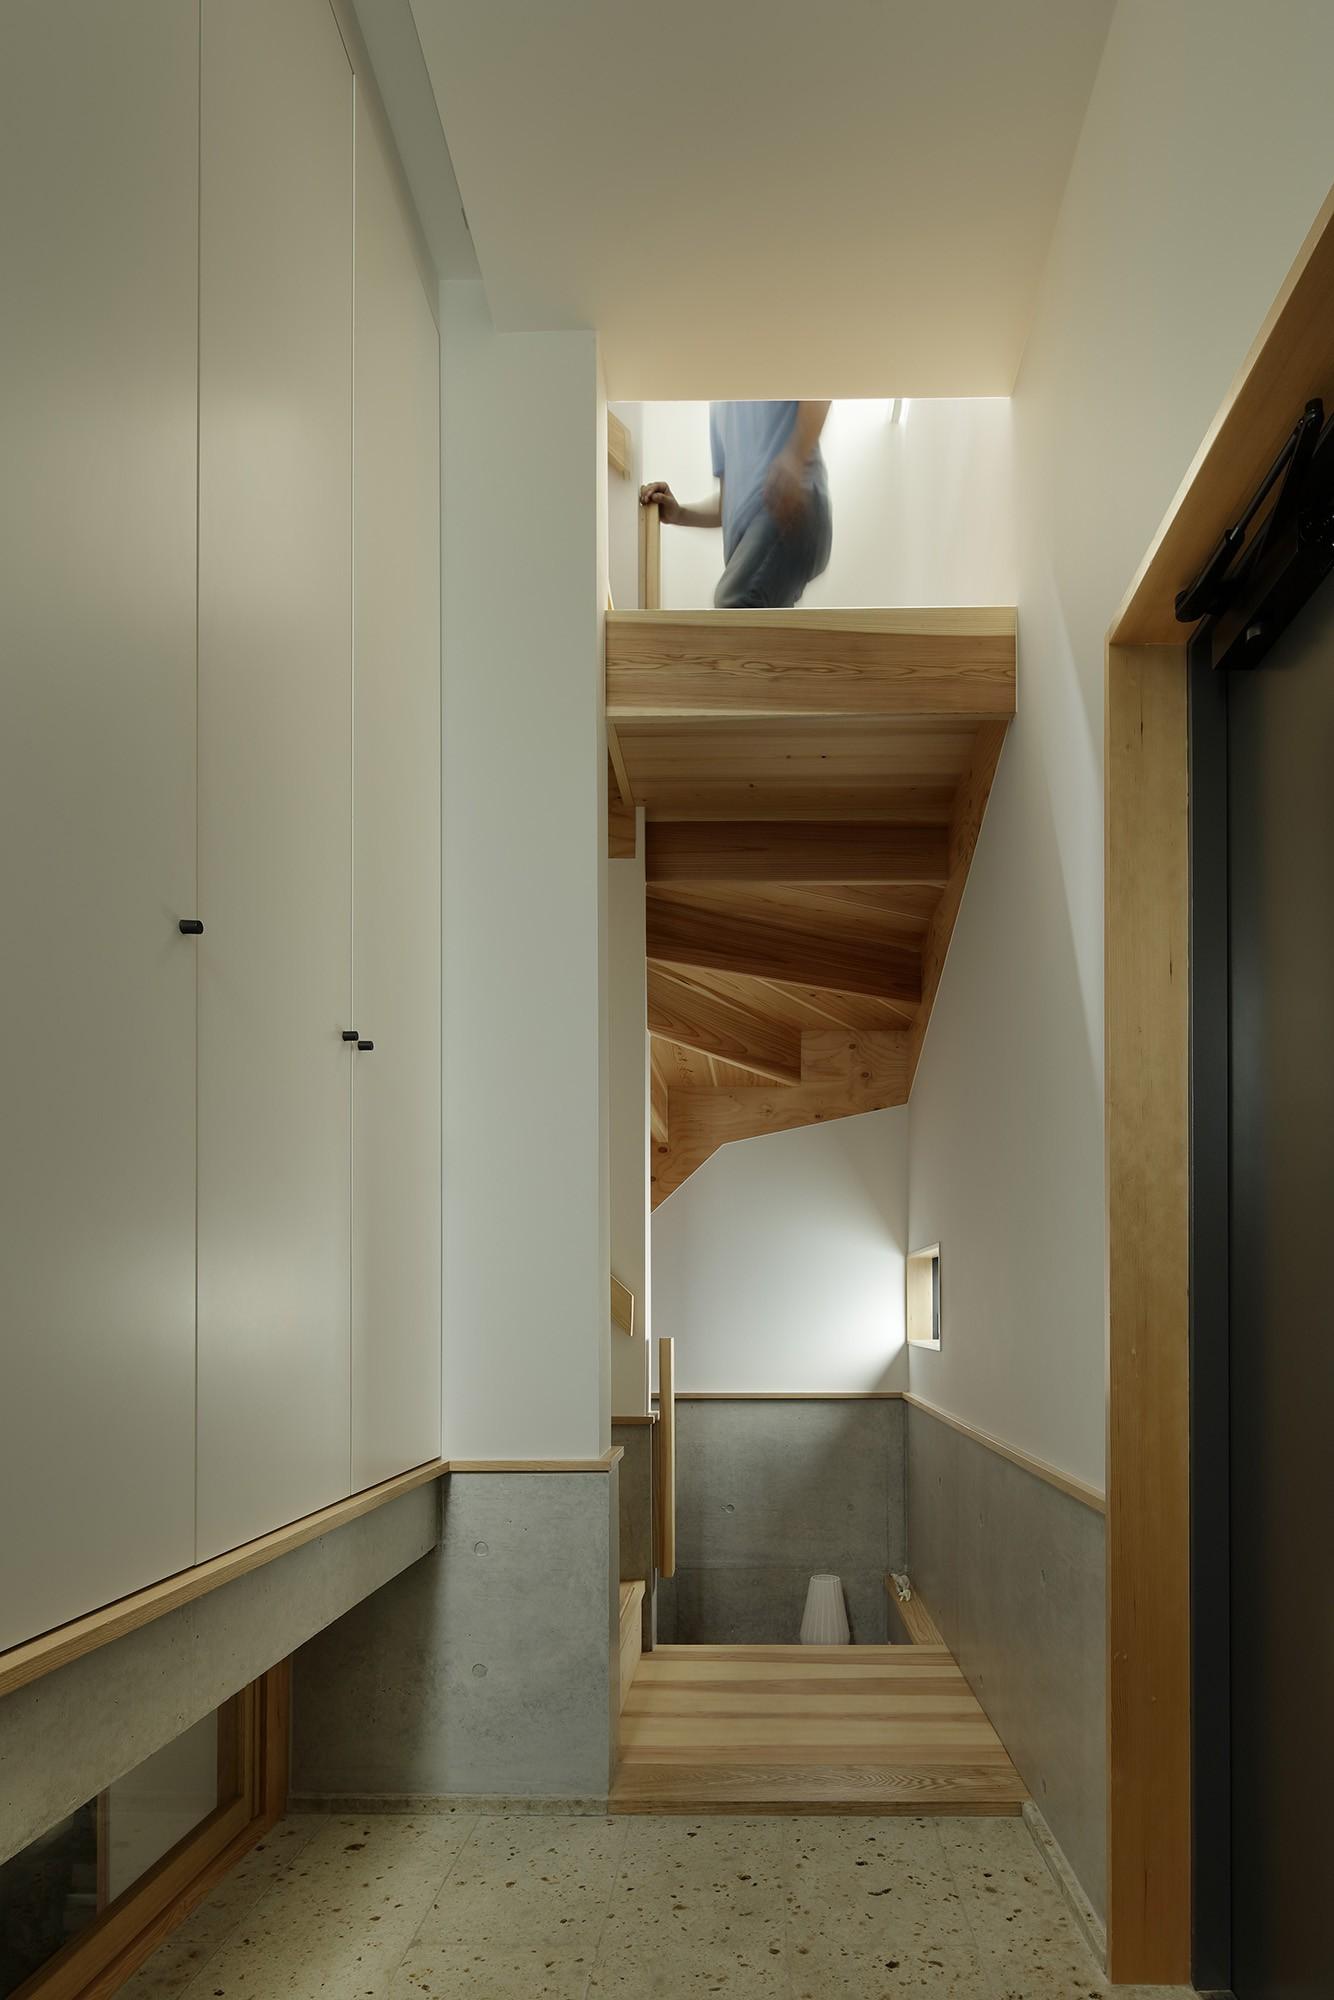 玄関事例:玄関と階段(桜上水の住宅 / 半地下と屋上の効果)